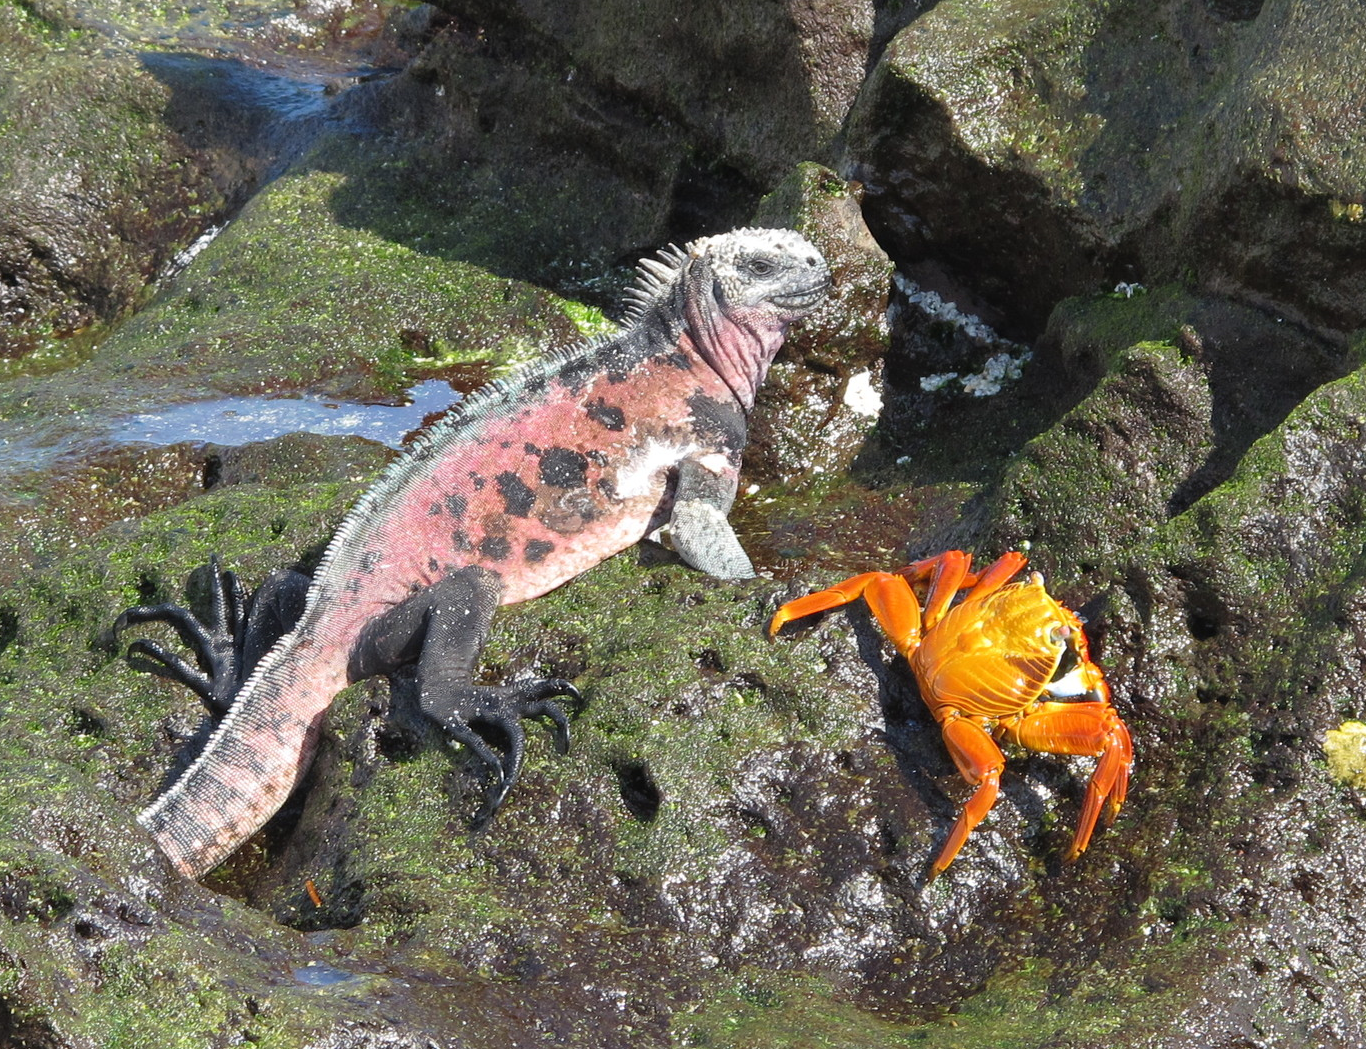 Brightly colored Española subspecies A. c. venustissimus shares a tidal rock with a Sally Lightfoot crab at Gardner Bay. Photo: Alan Abonyi